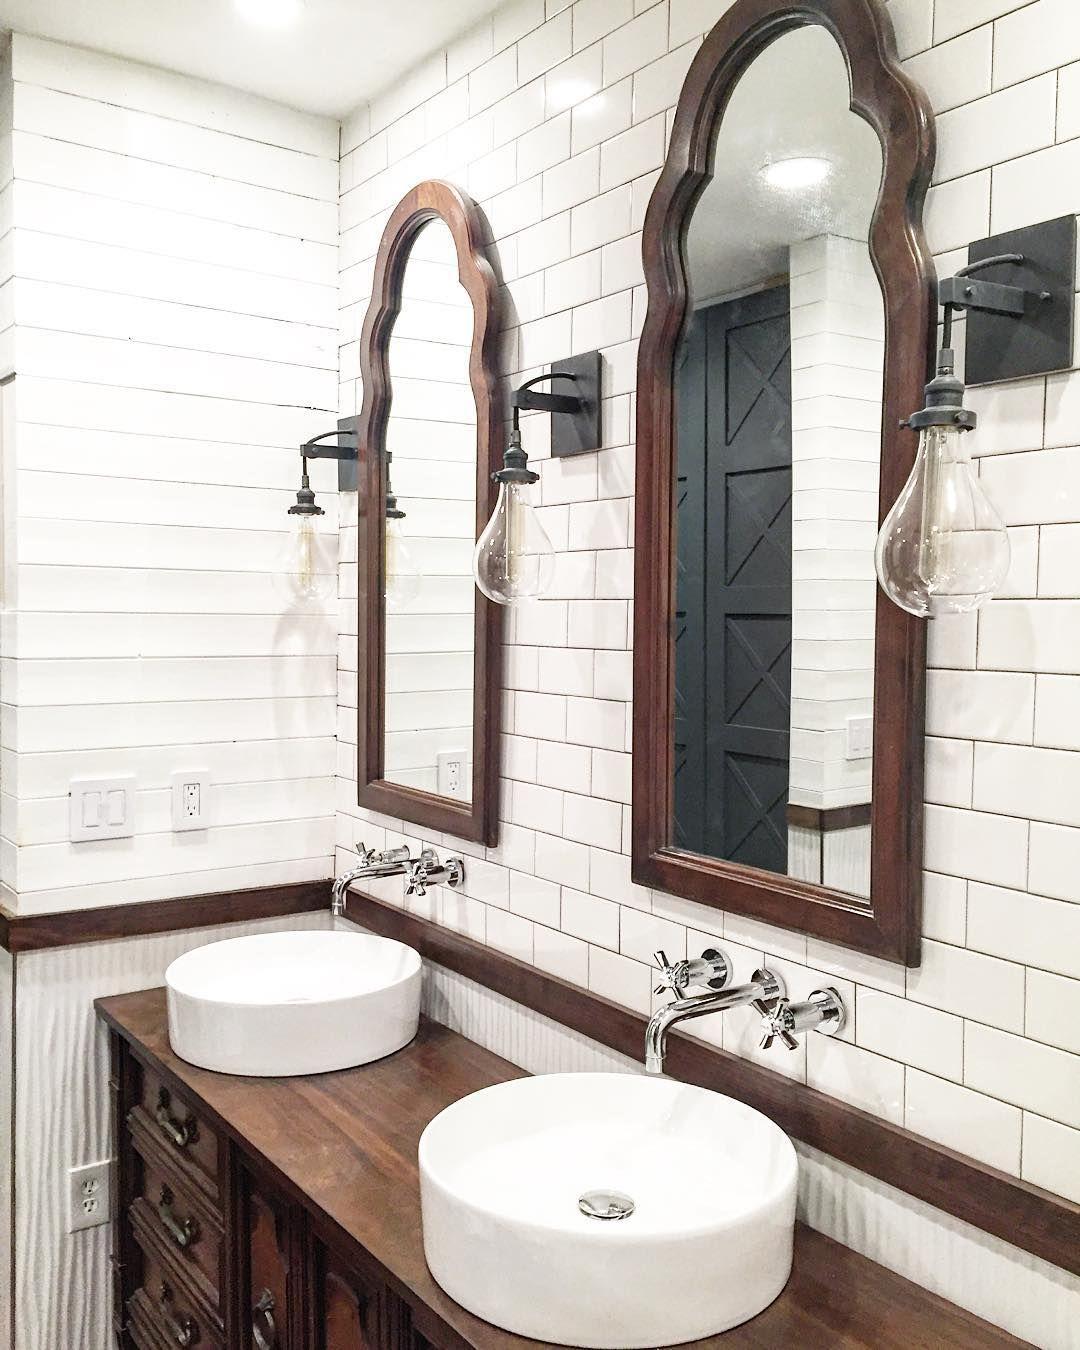 Rustic farmhouse bathroom design with plank walls and for Farmhouse bathroom tile design ideas